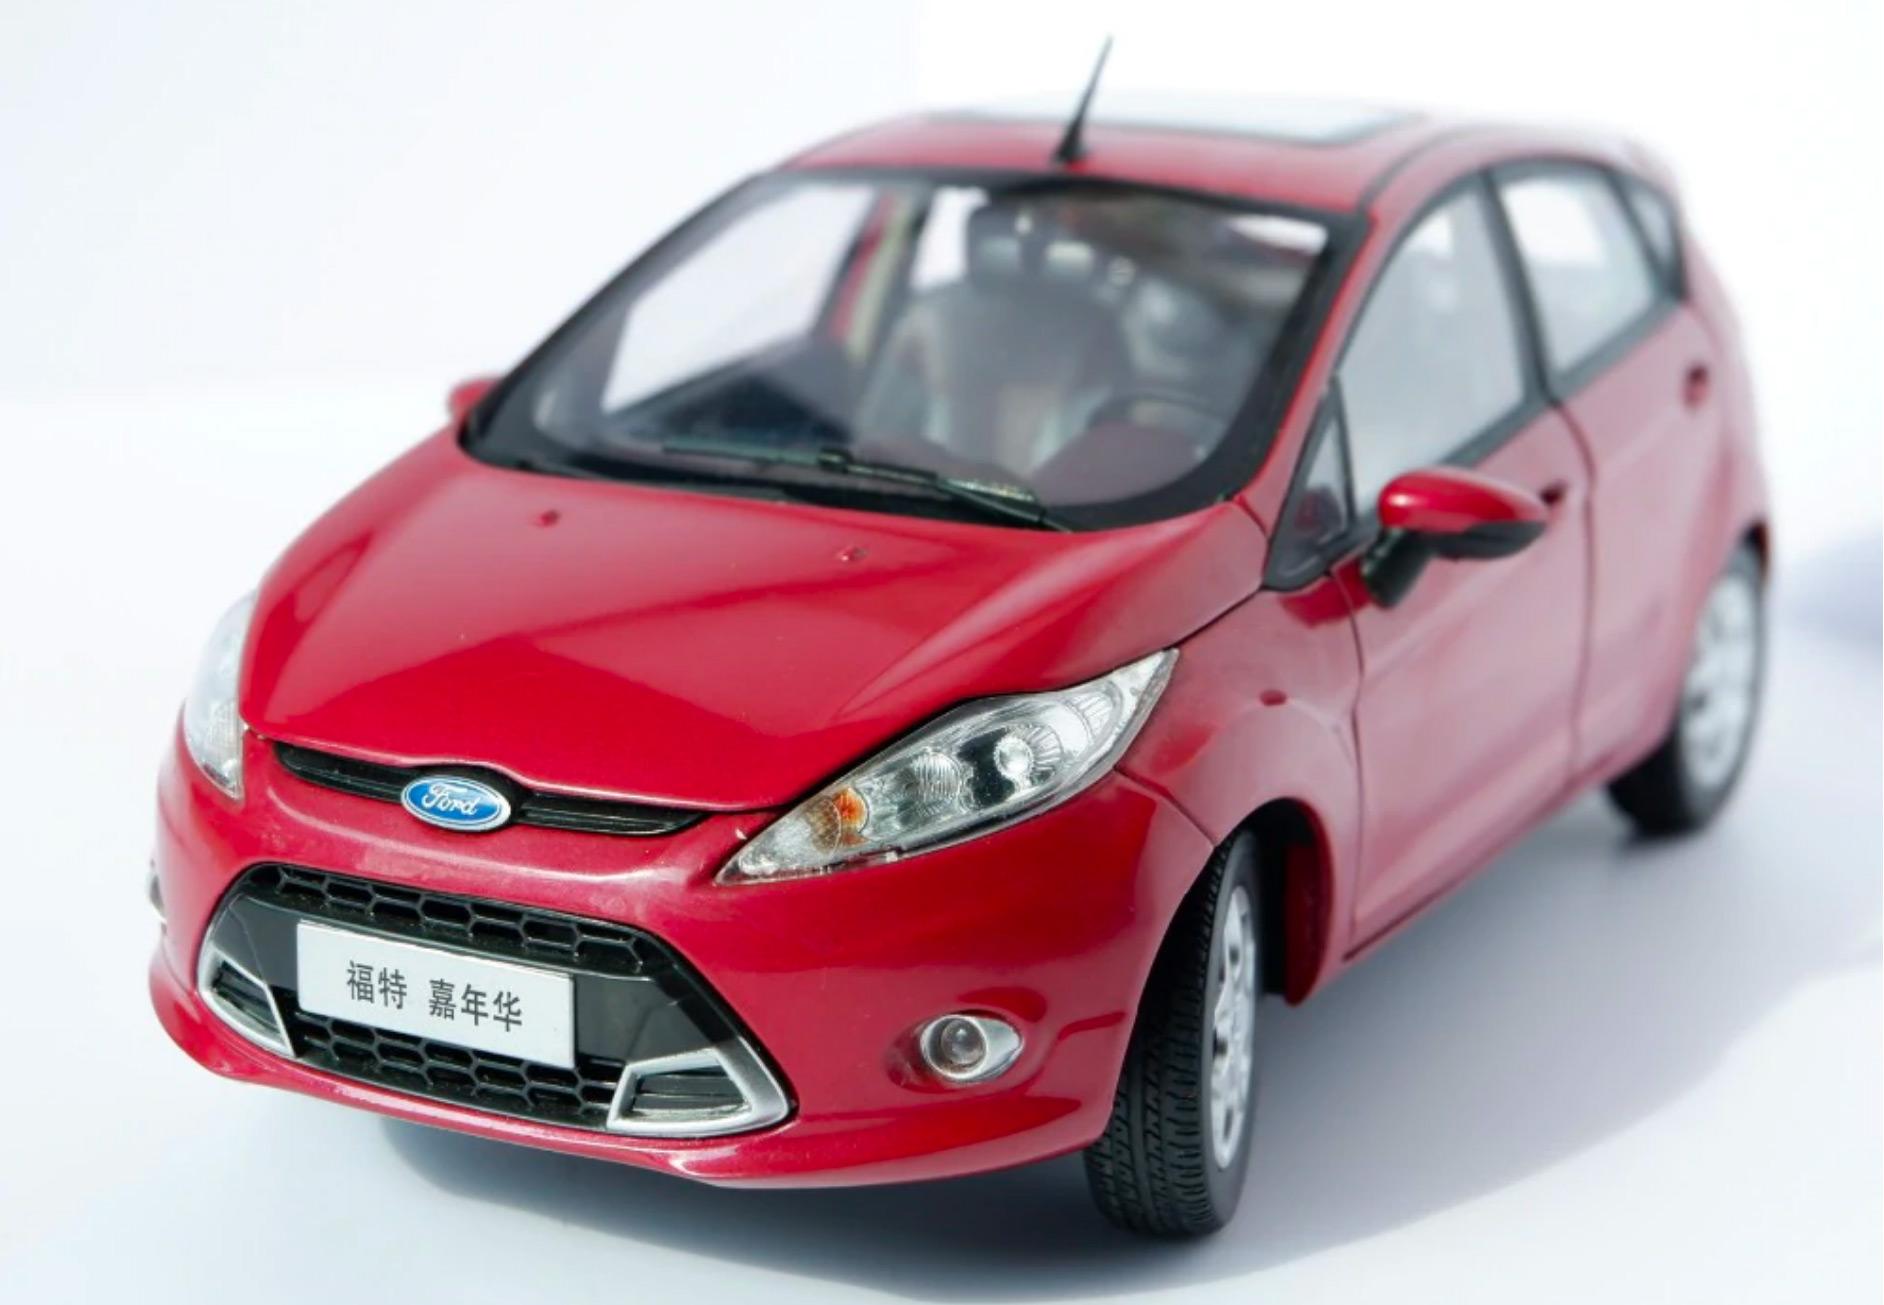 1/18 Ford Fiesta Paudi promotion